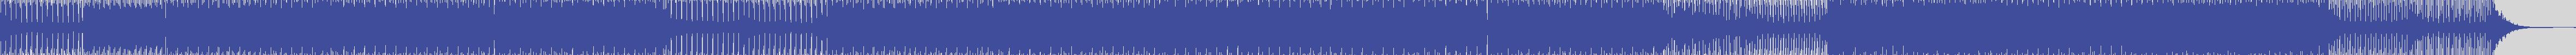 just_digital_records [JS1191] Marco Furnari - Waiting for the Sun [Robert Tamascelli Remix] audio wave form